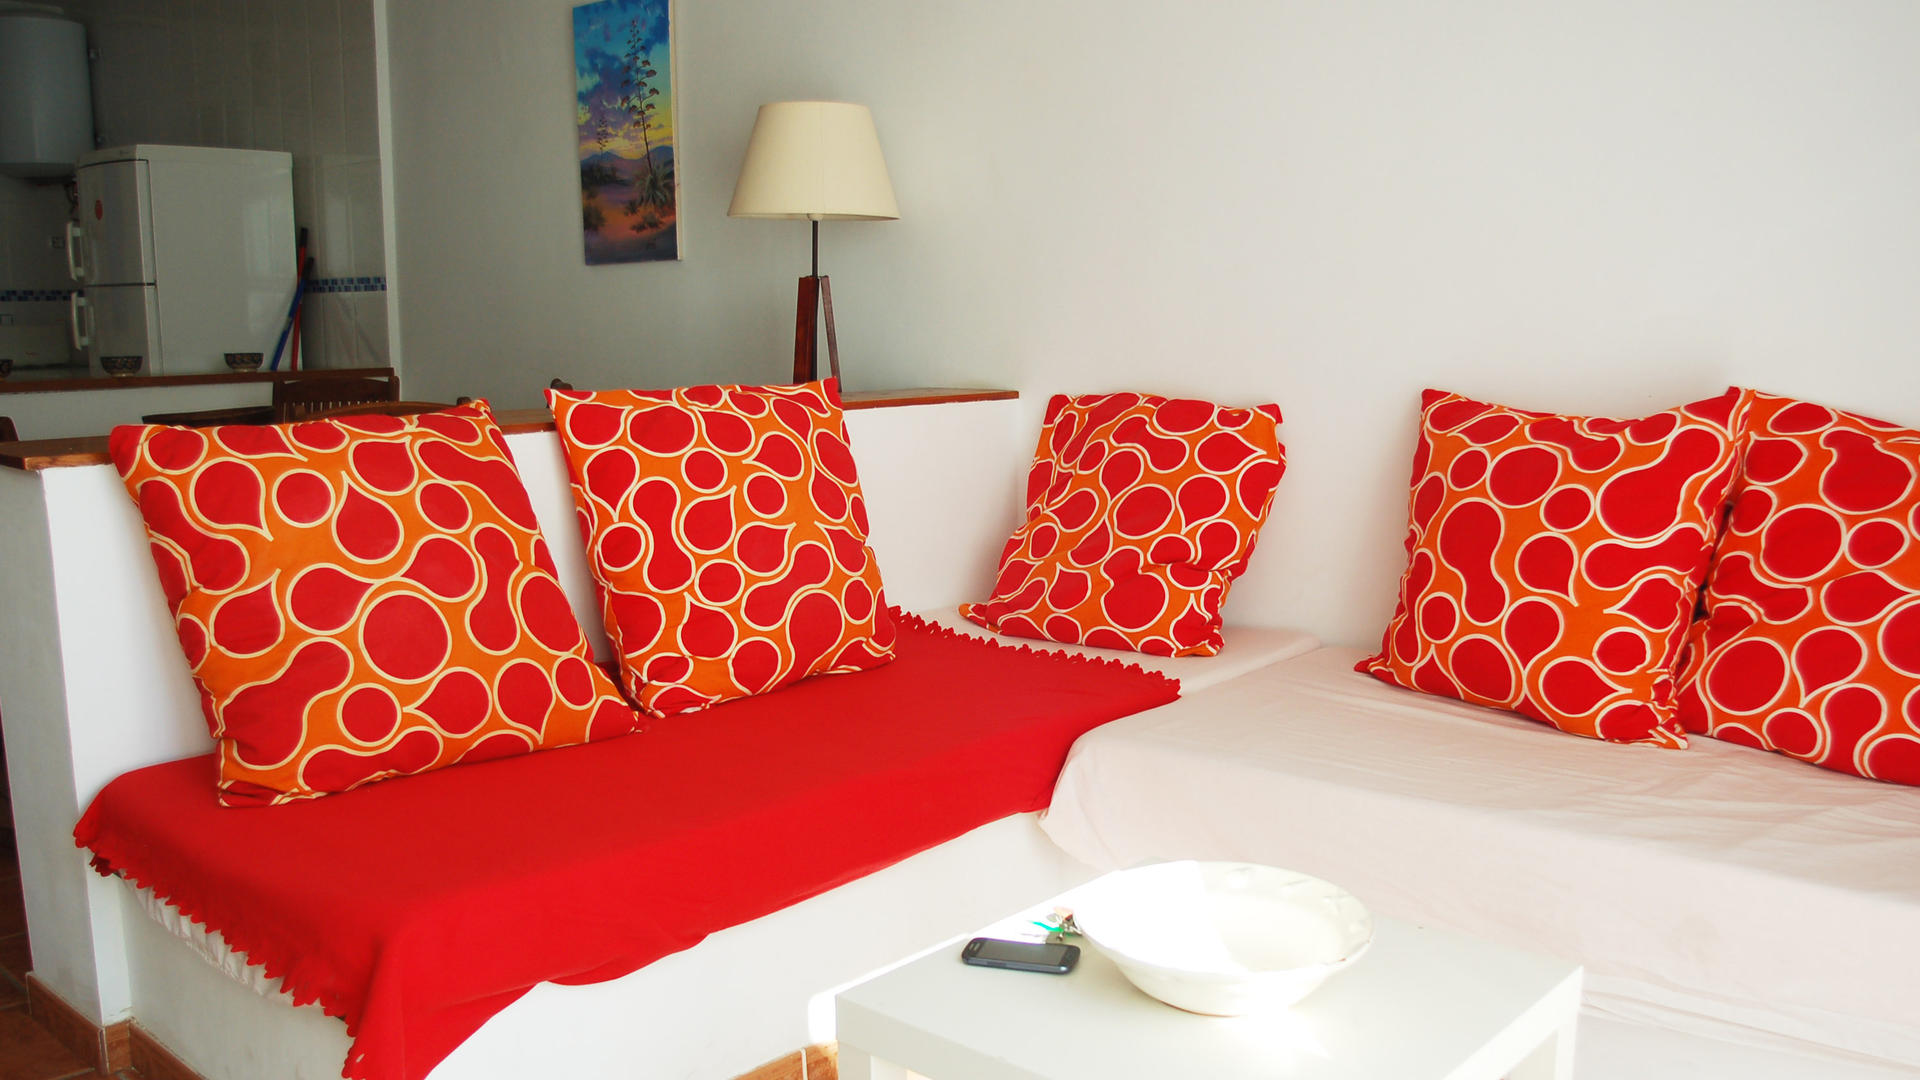 Apartamento -                                       Las Negras -                                       2 dormitorios -                                       6 ocupantes